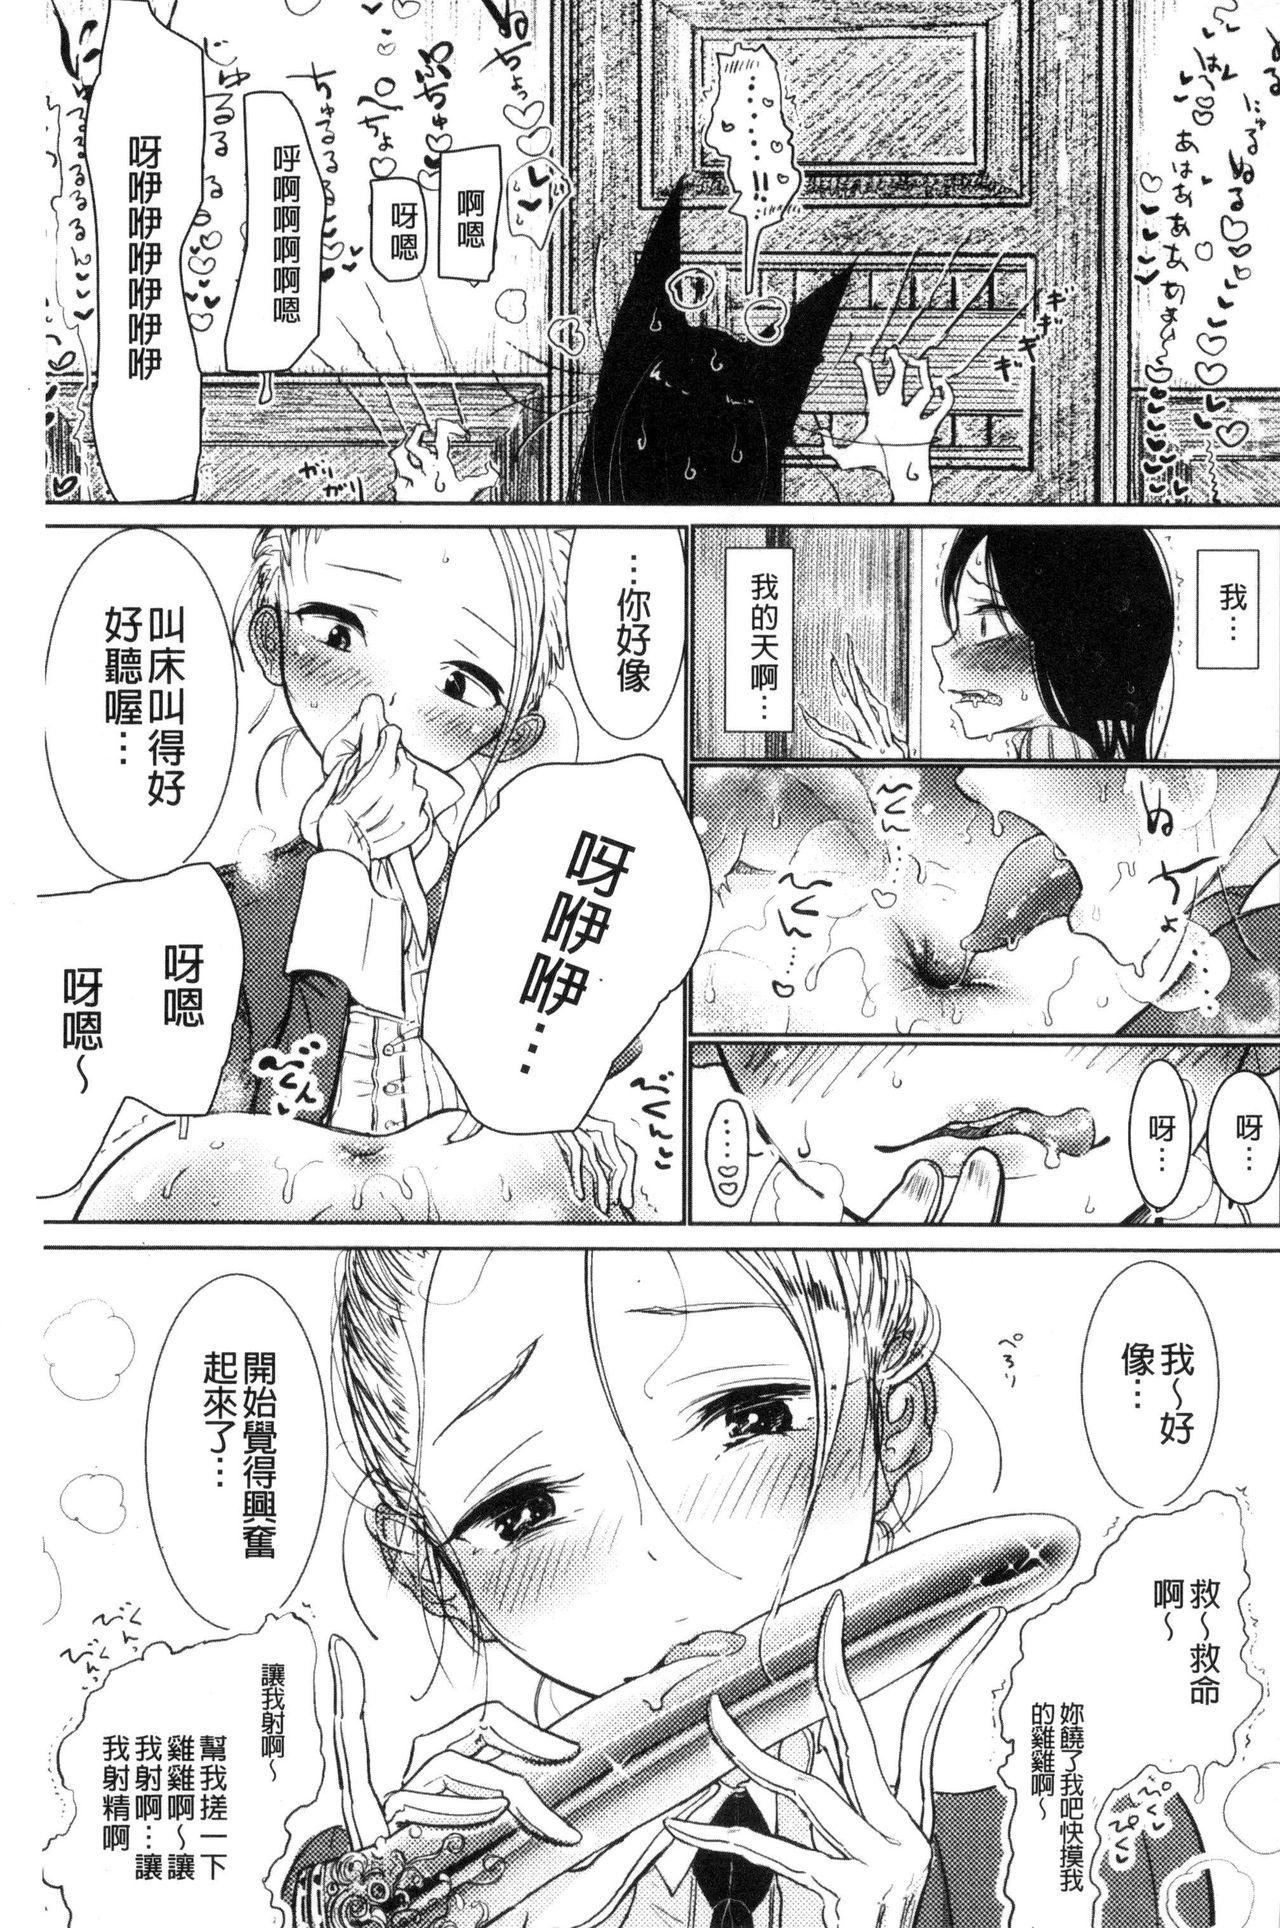 [Dhibi] Sono Yubisaki de Korogashite - Please Caress it at the Finger-tip. [Chinese] 34